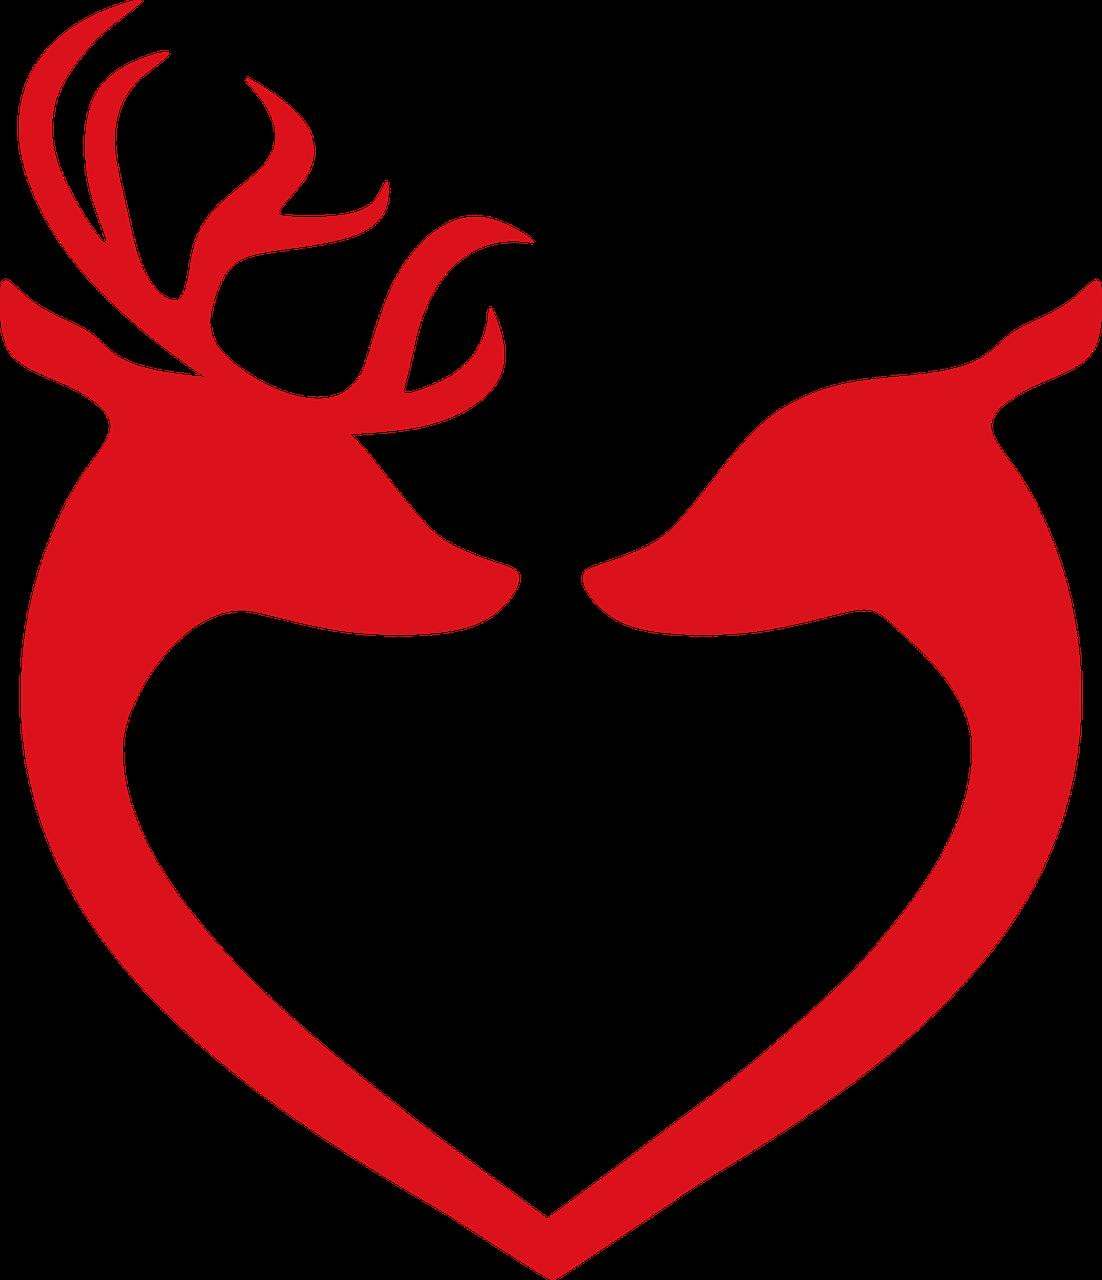 Free image on pixabay. Clipart reindeer ornament antler clipart